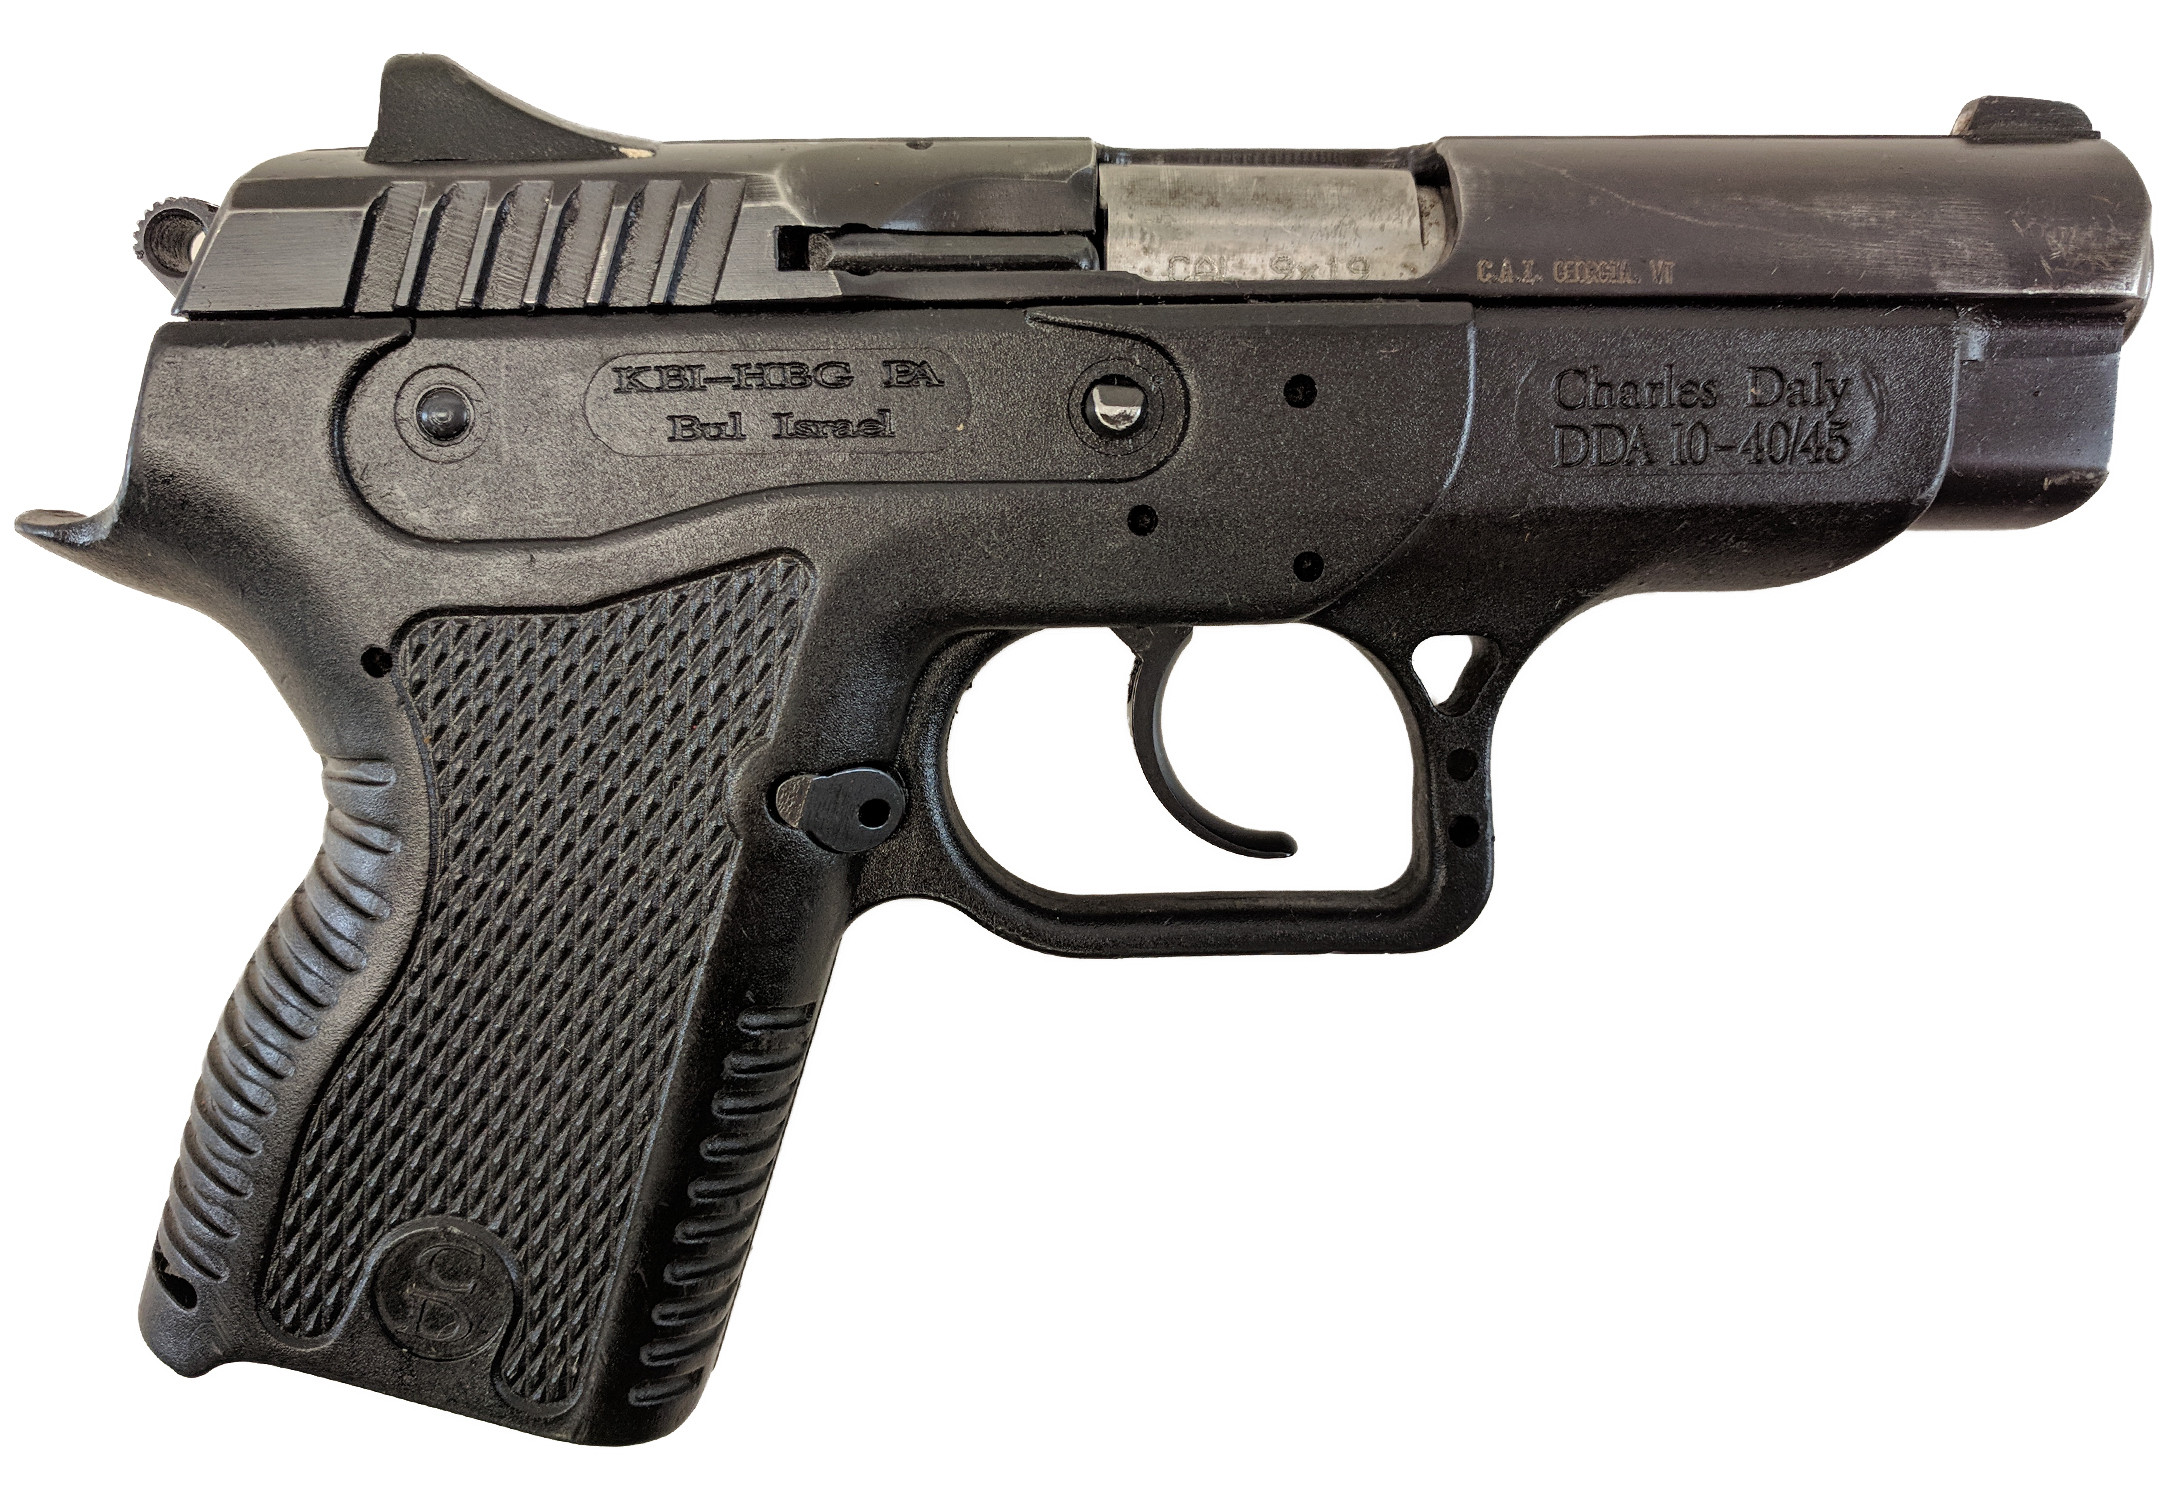 BUL Charles Daly DDA10-40/45, 9mm, *Good, No Magazine*